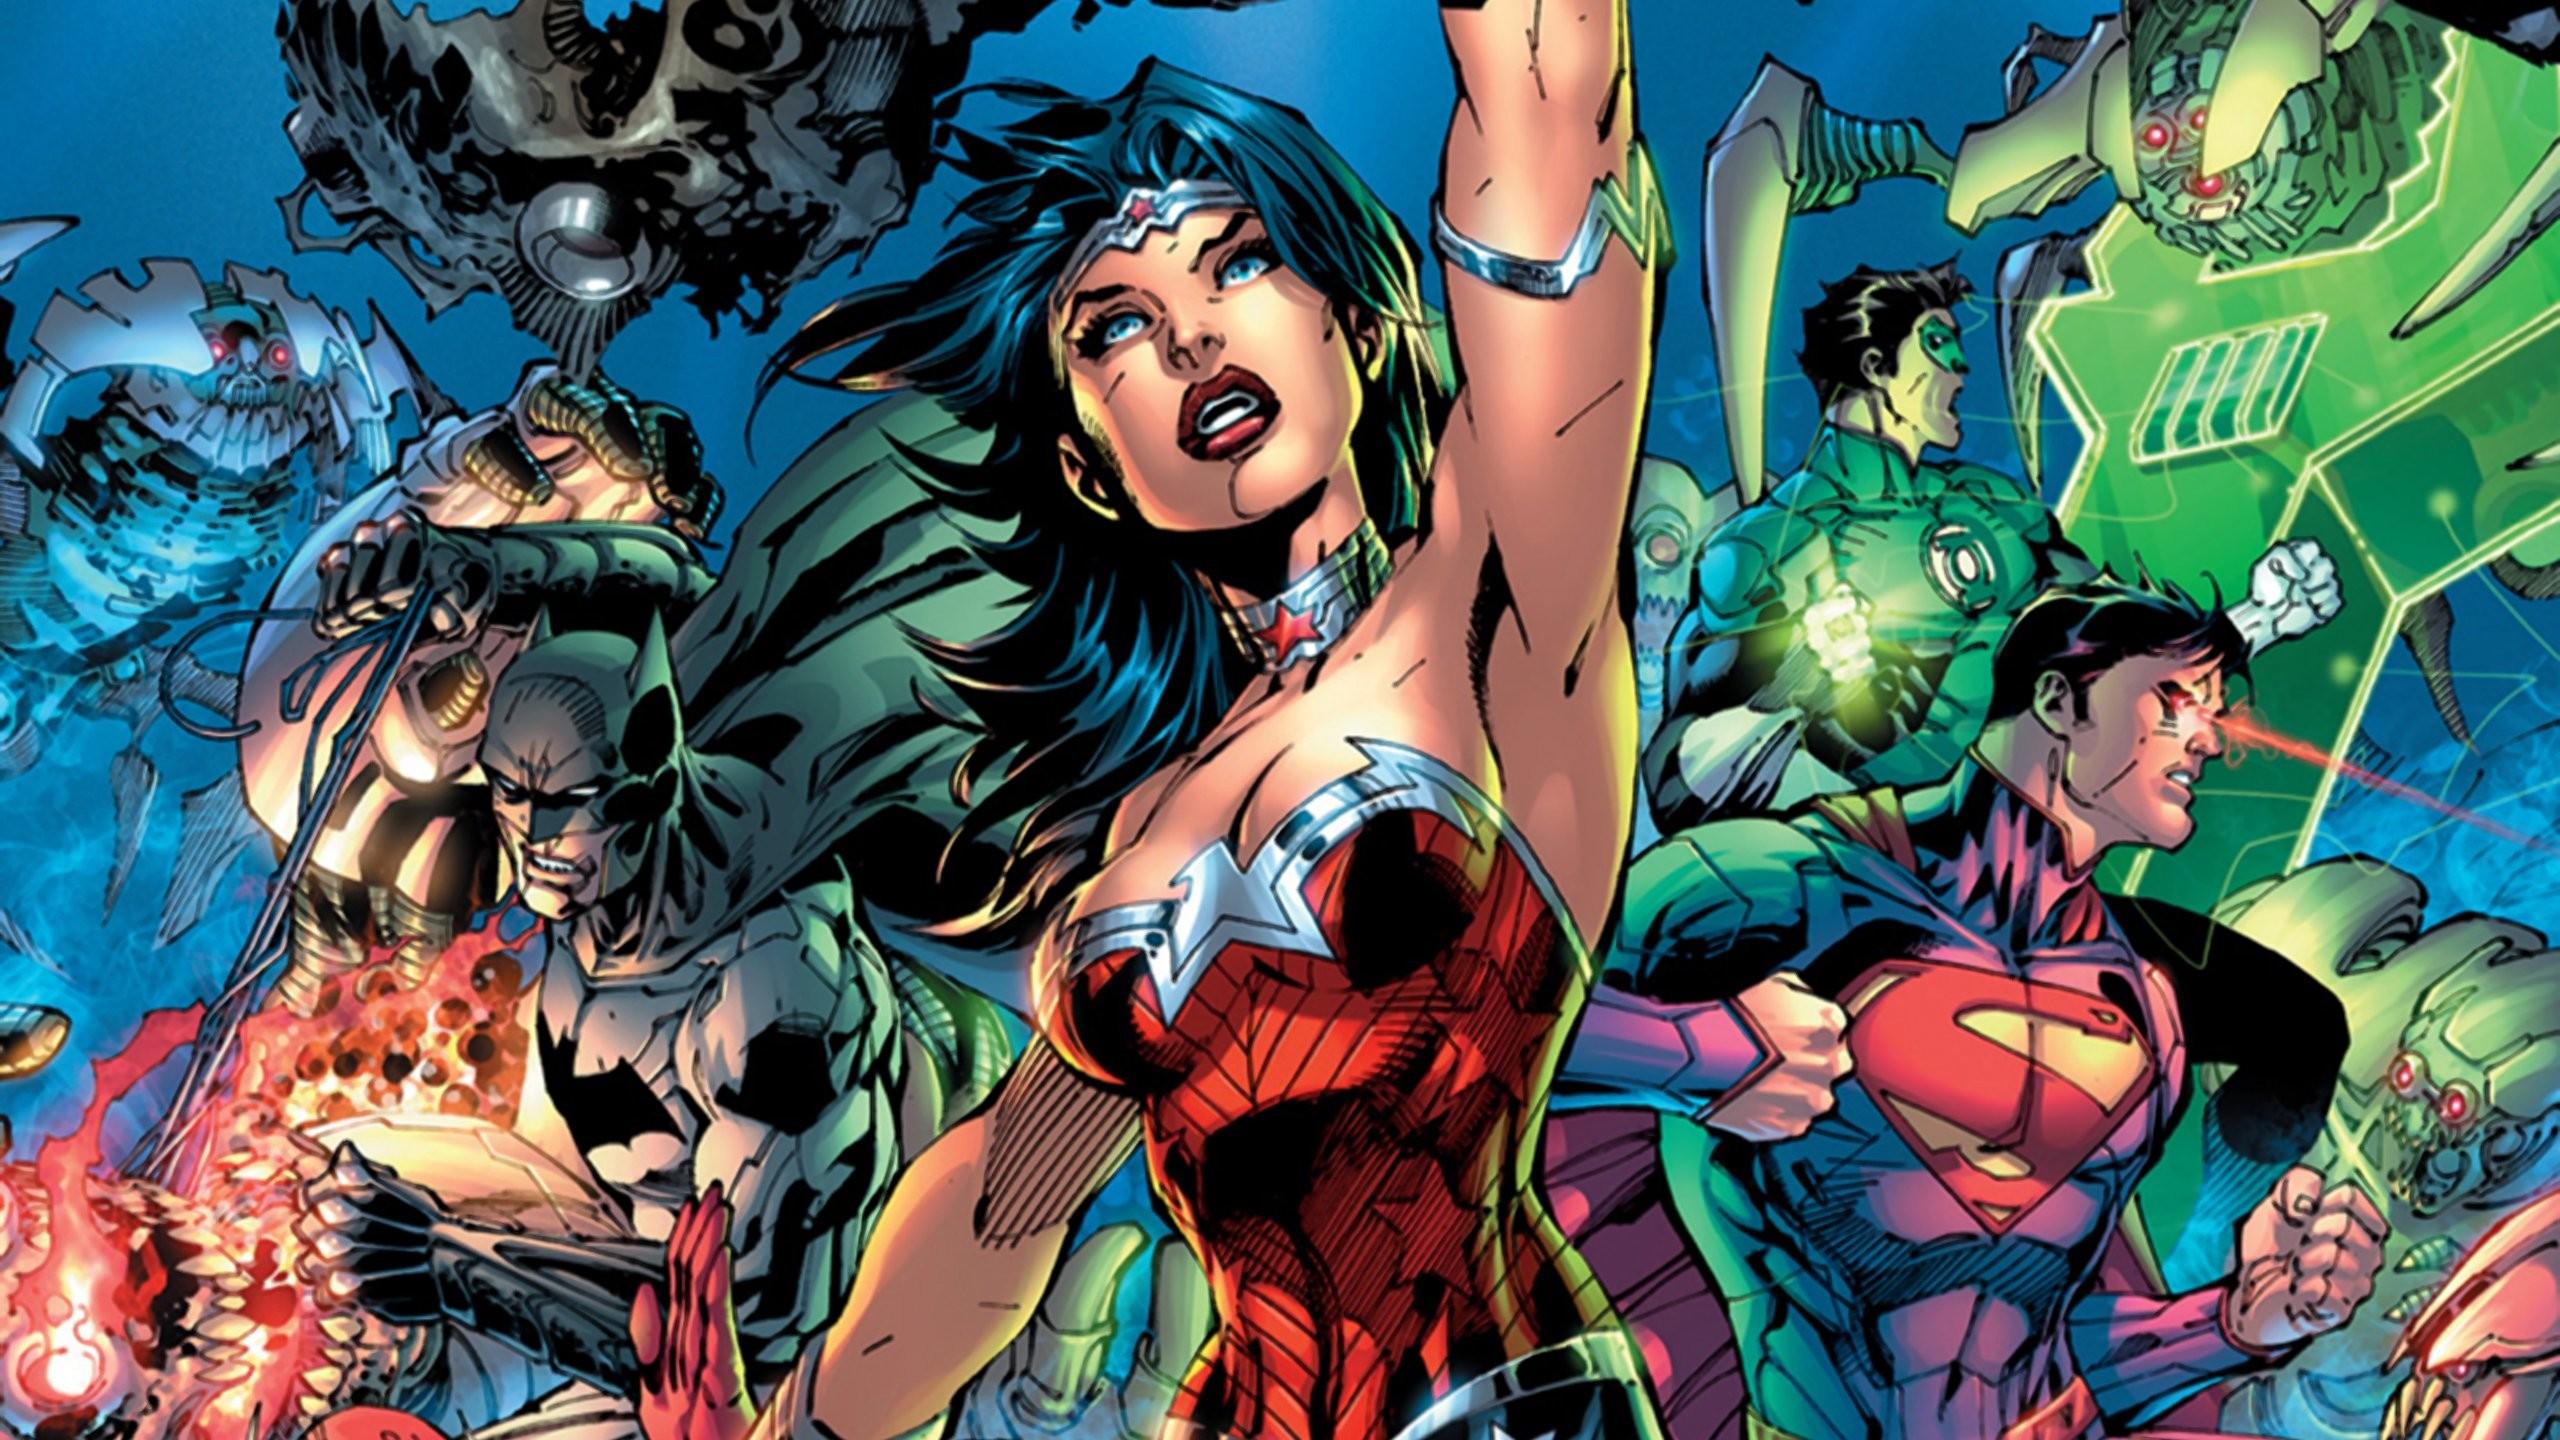 New 52 Trinity Superman Batman Wonder Woman wallpaper | .